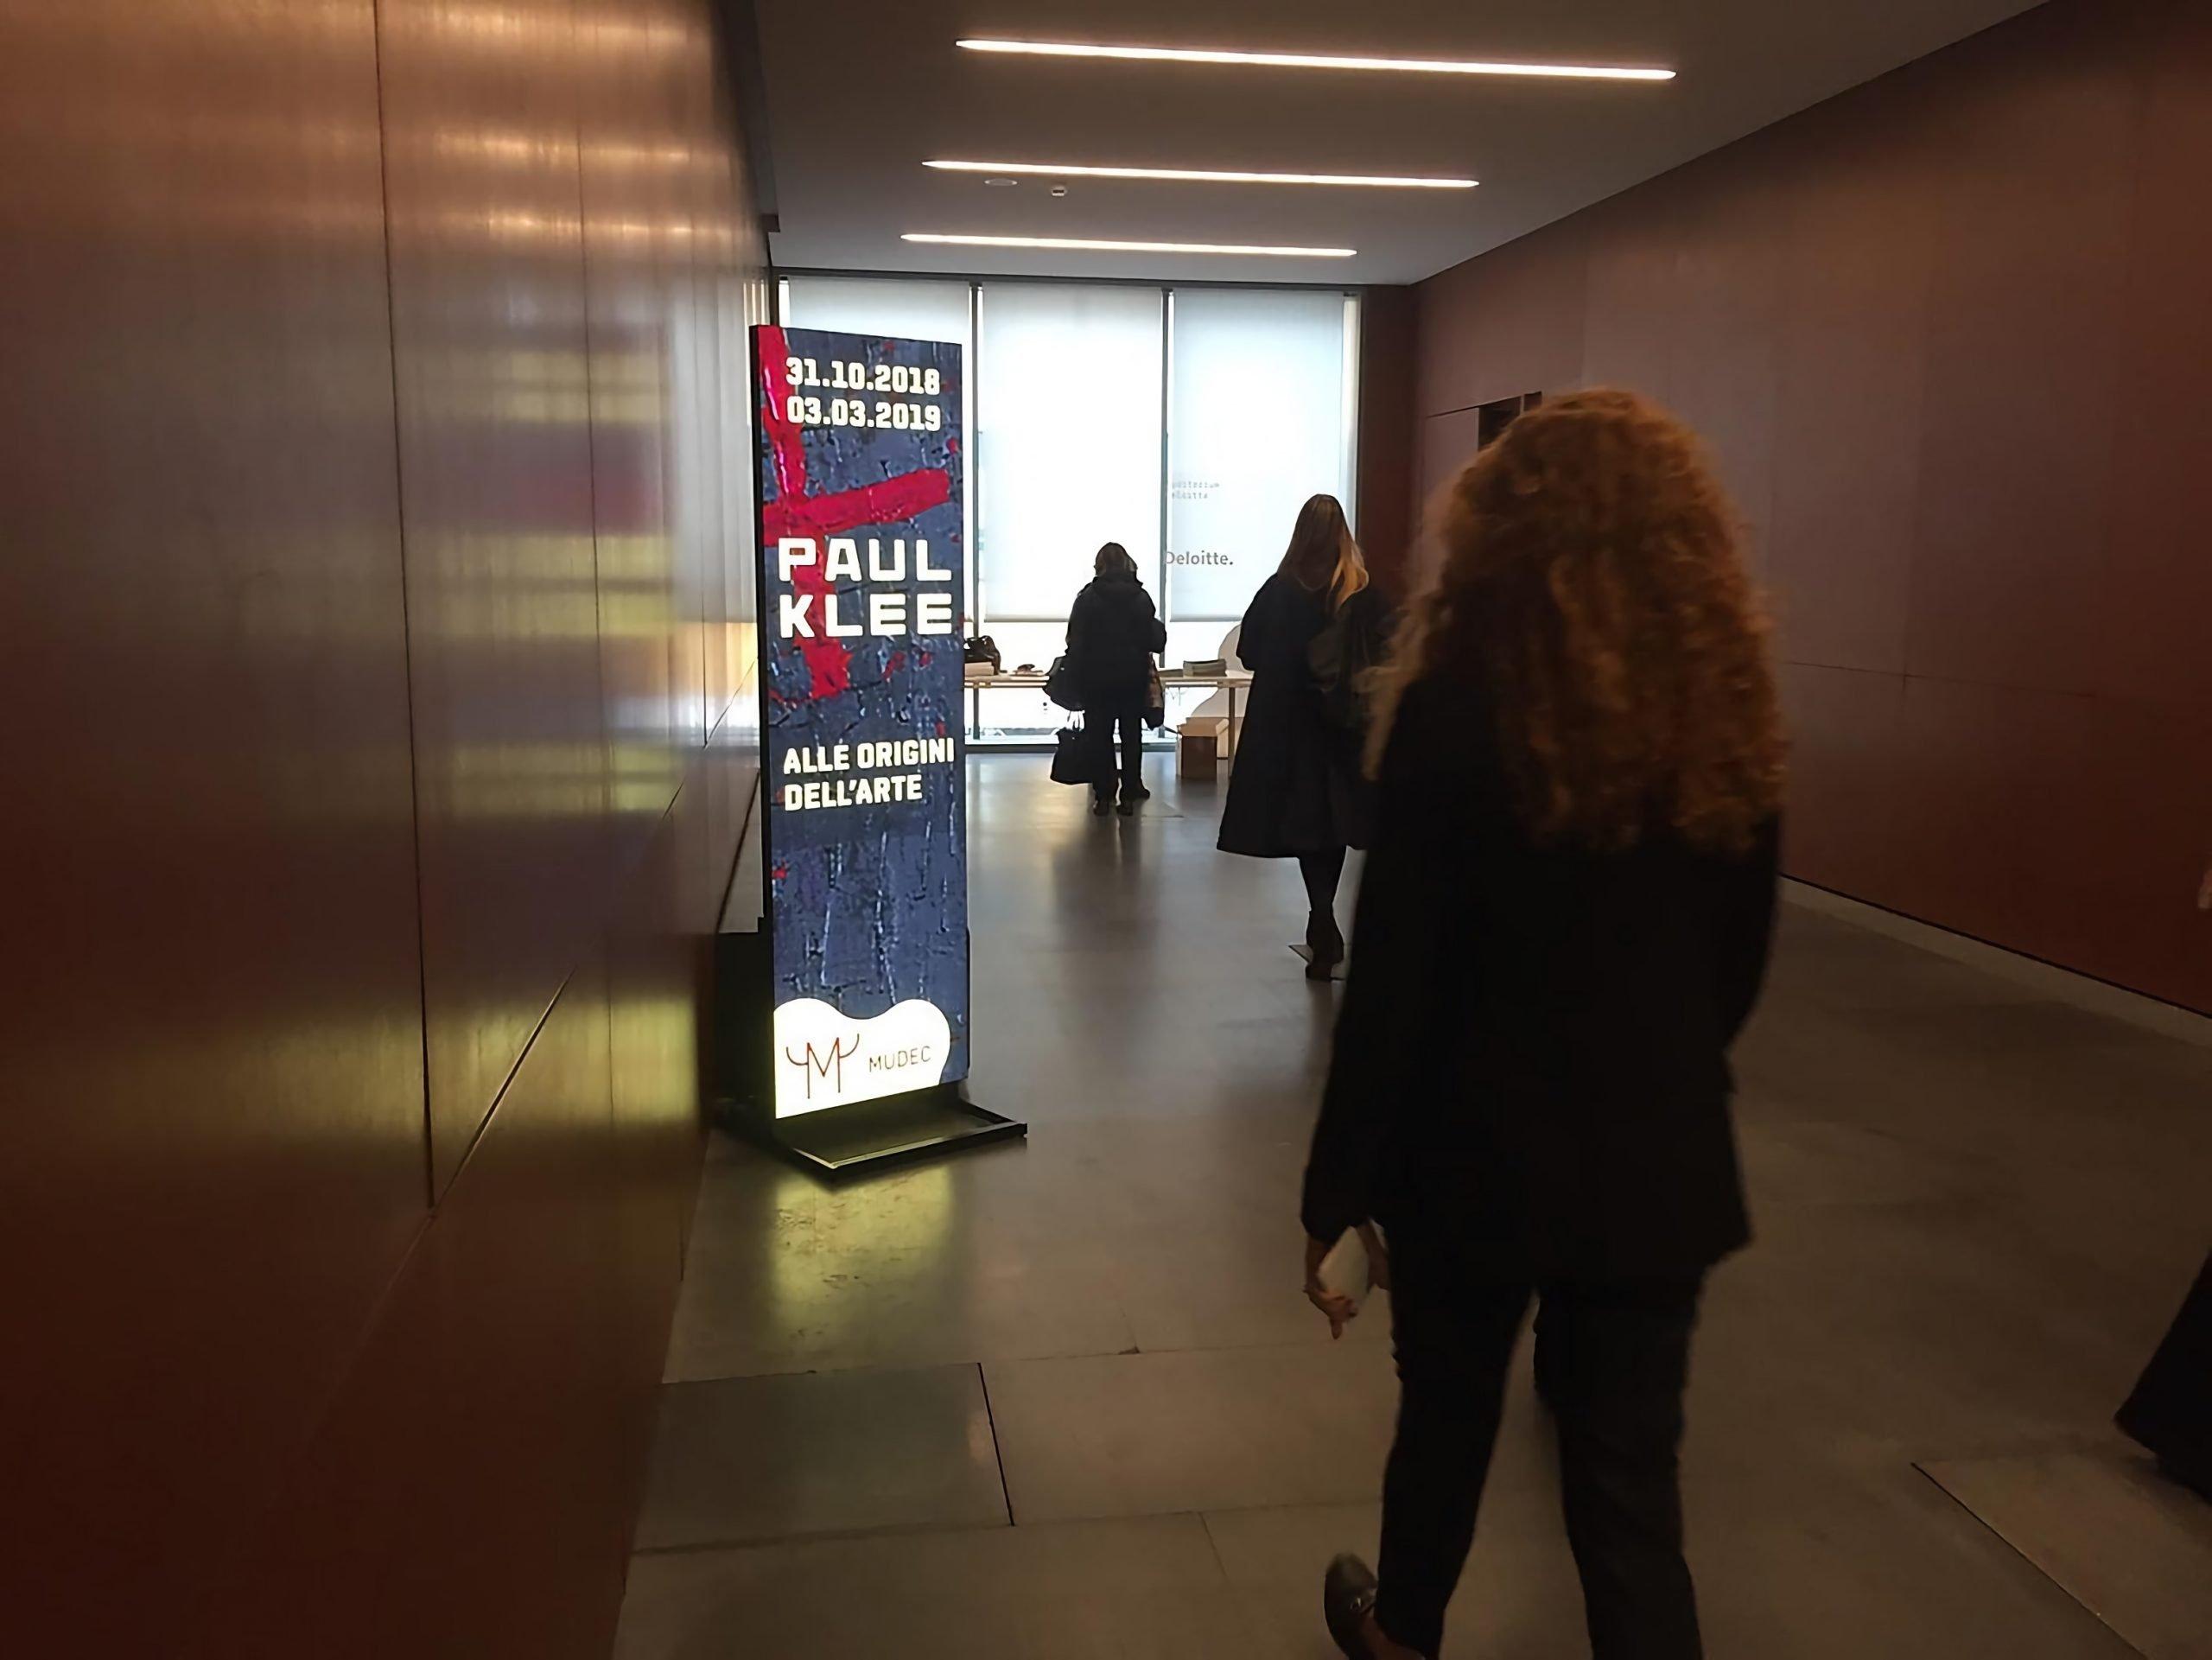 poster-led-display